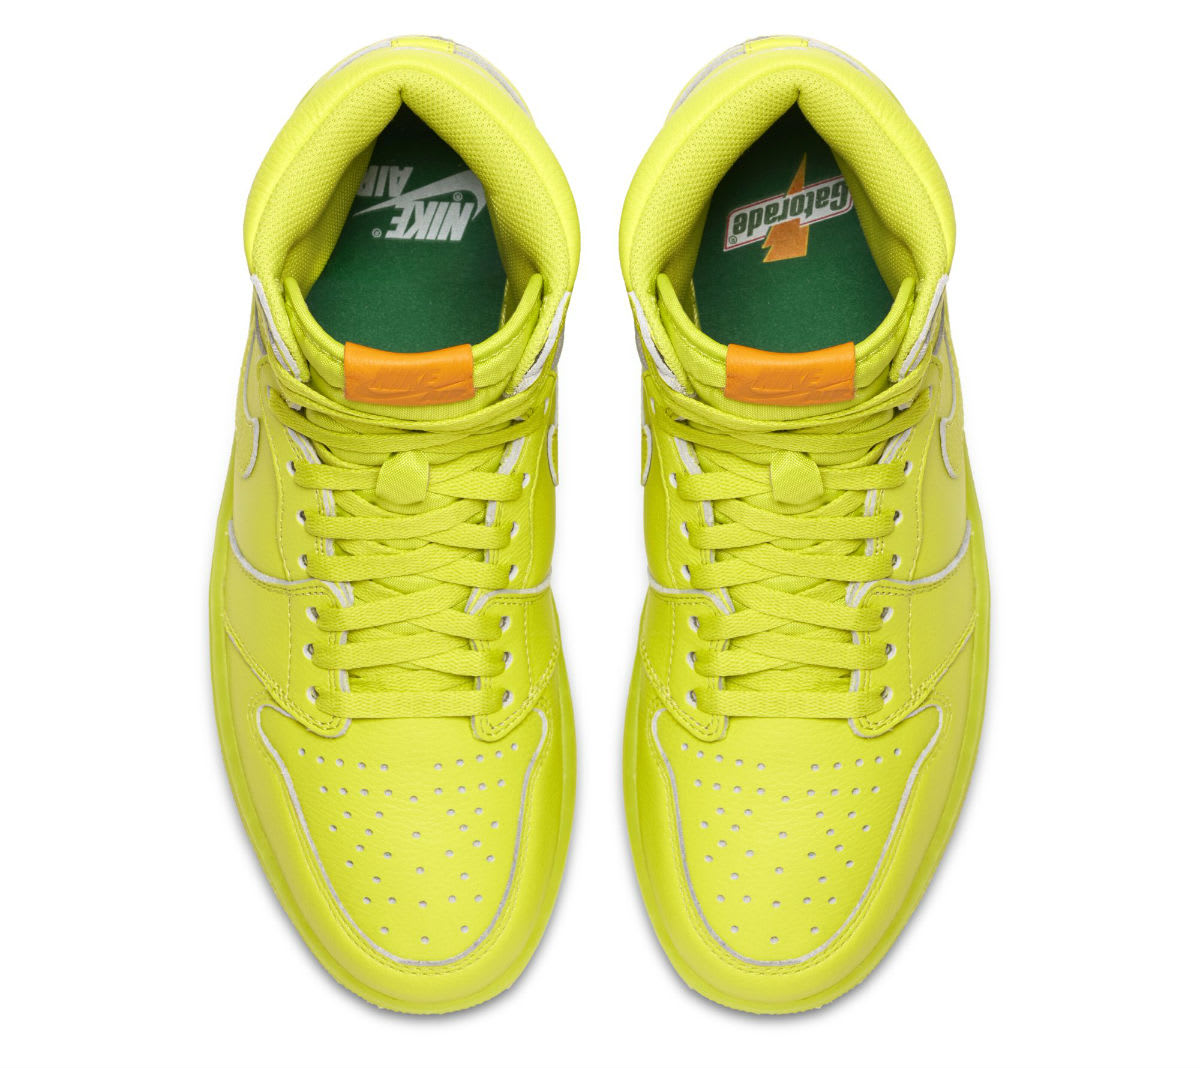 Air Jordan 1 Gatorade Cyber Yellow Lime Release Date AJ5997-345 Top